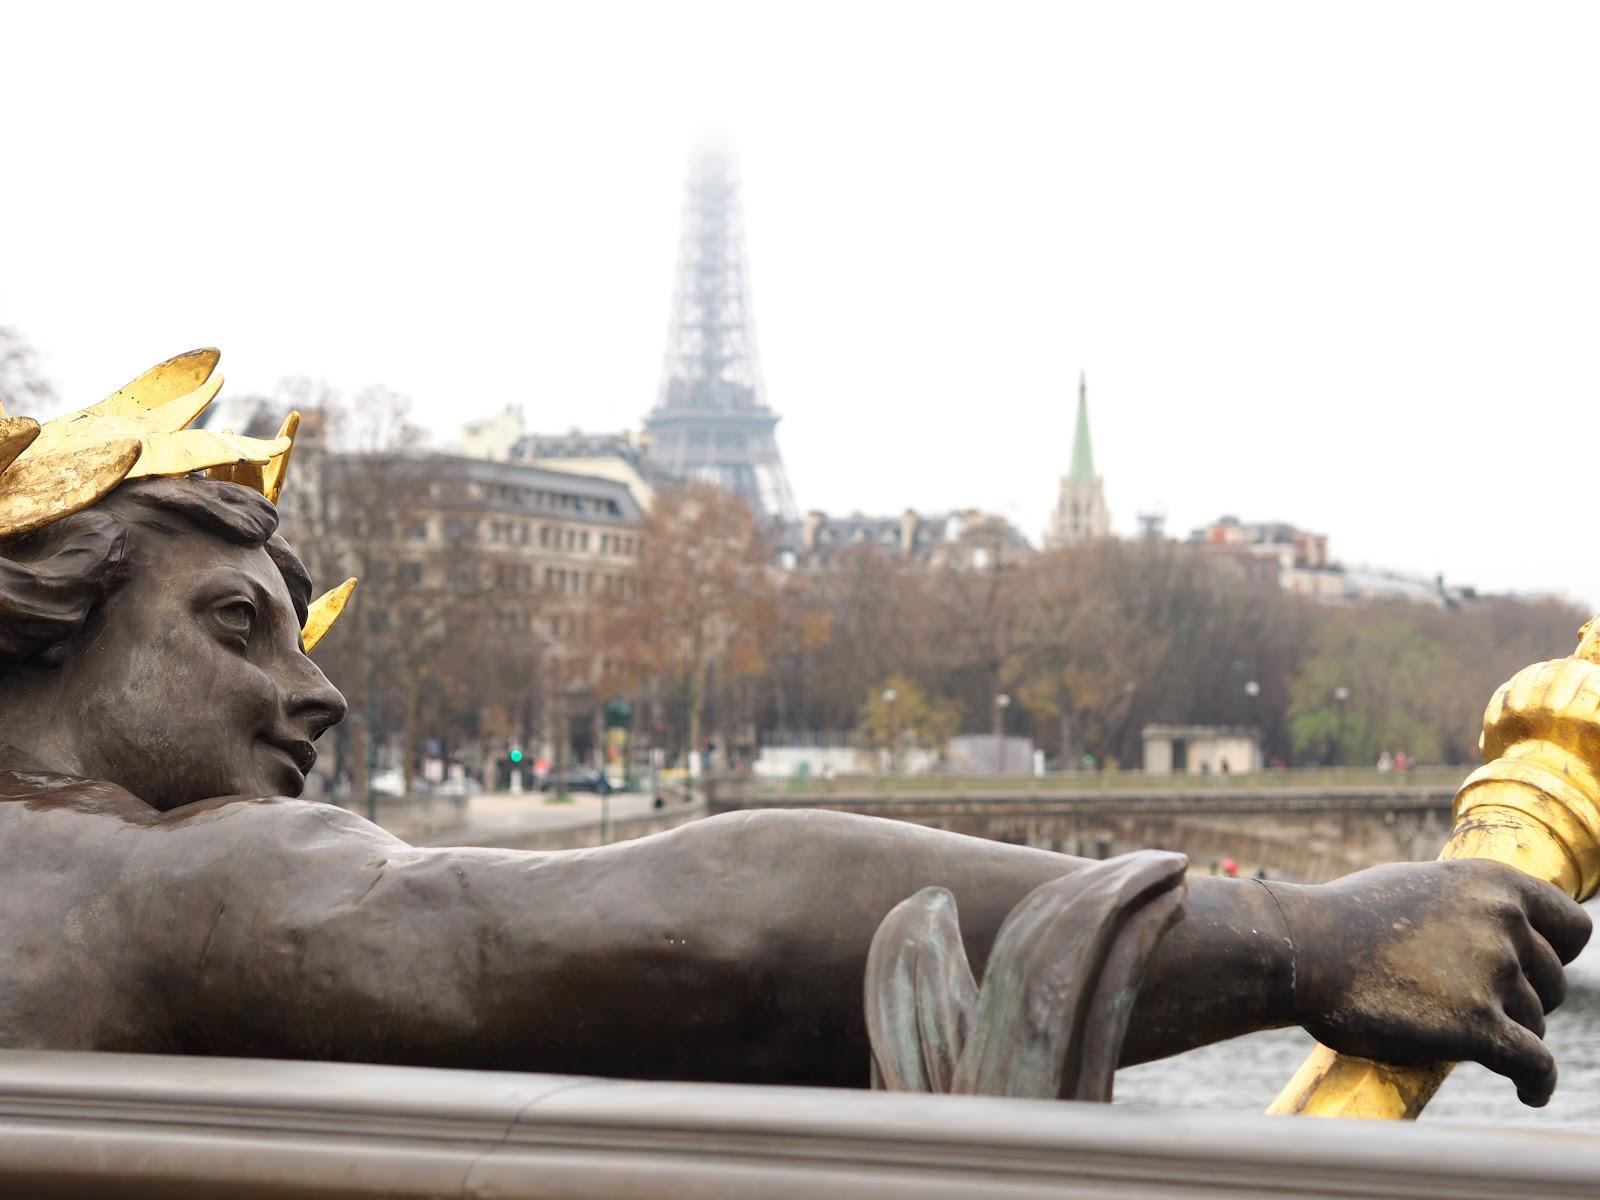 Paris Pont De Alexandre III bridge, Gold and turquoise bridge, paris